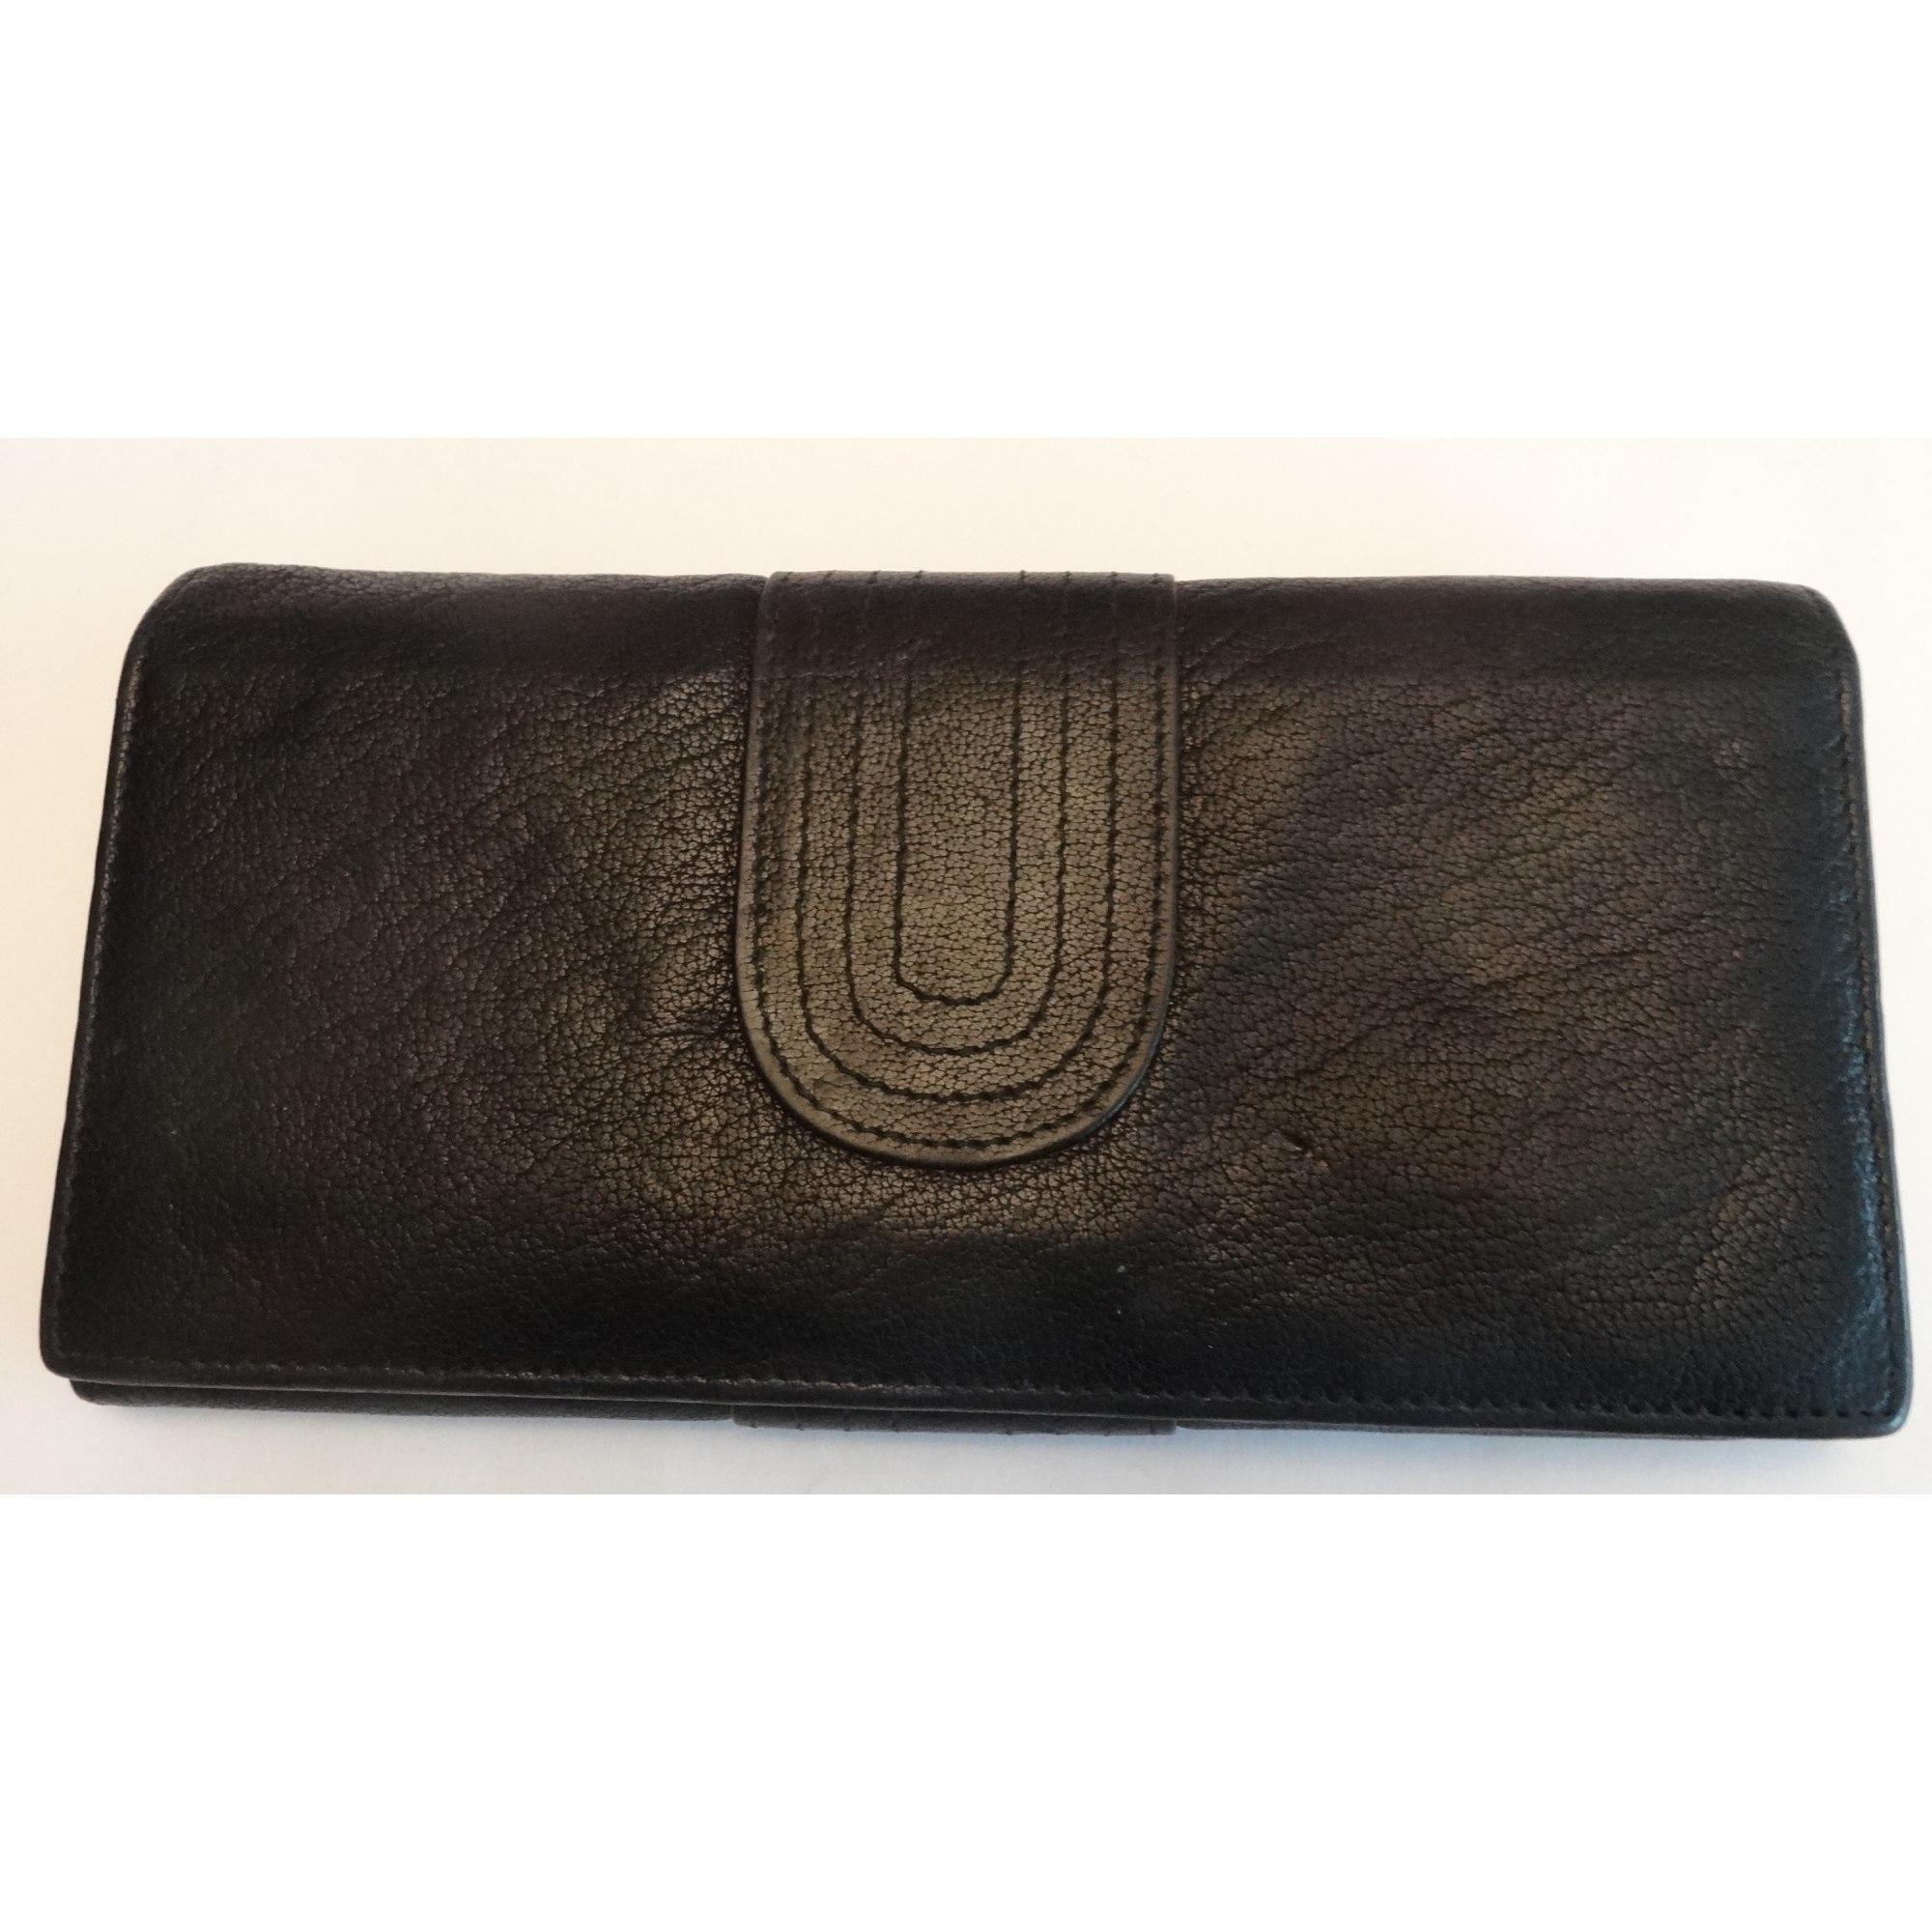 Portefeuille BRONTIBAY cuir noir